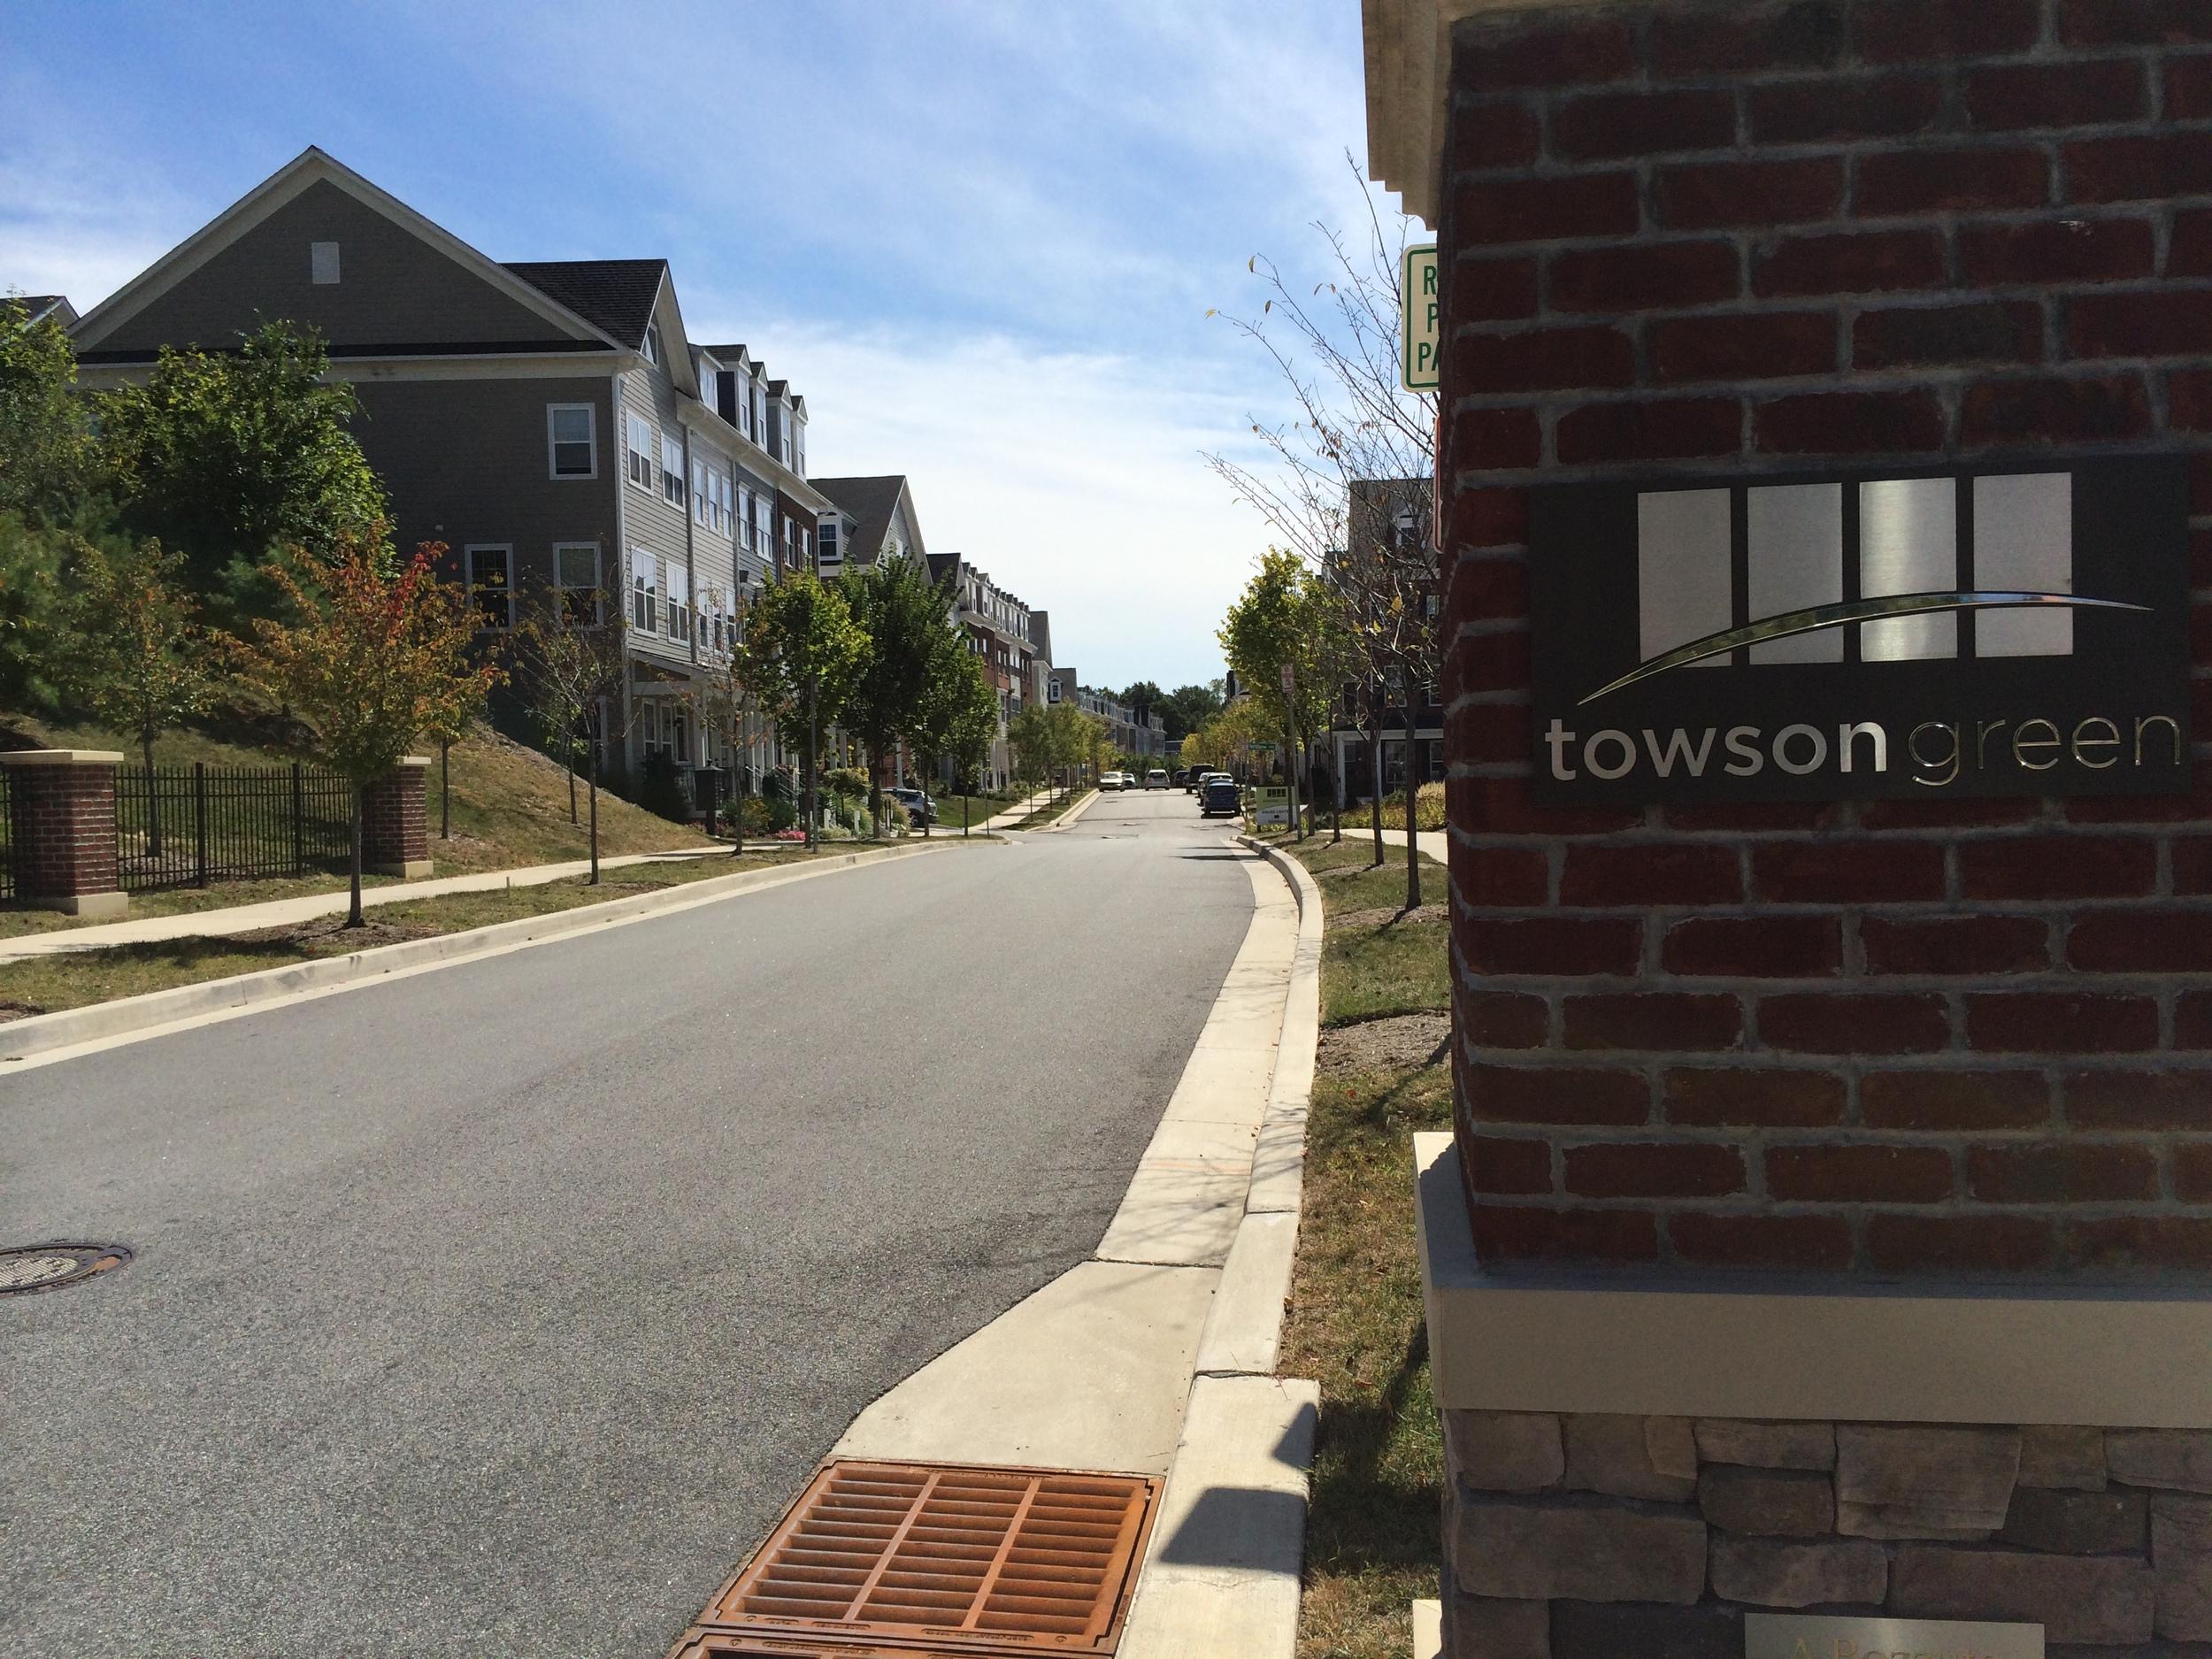 Towson Green Development Located in TMV